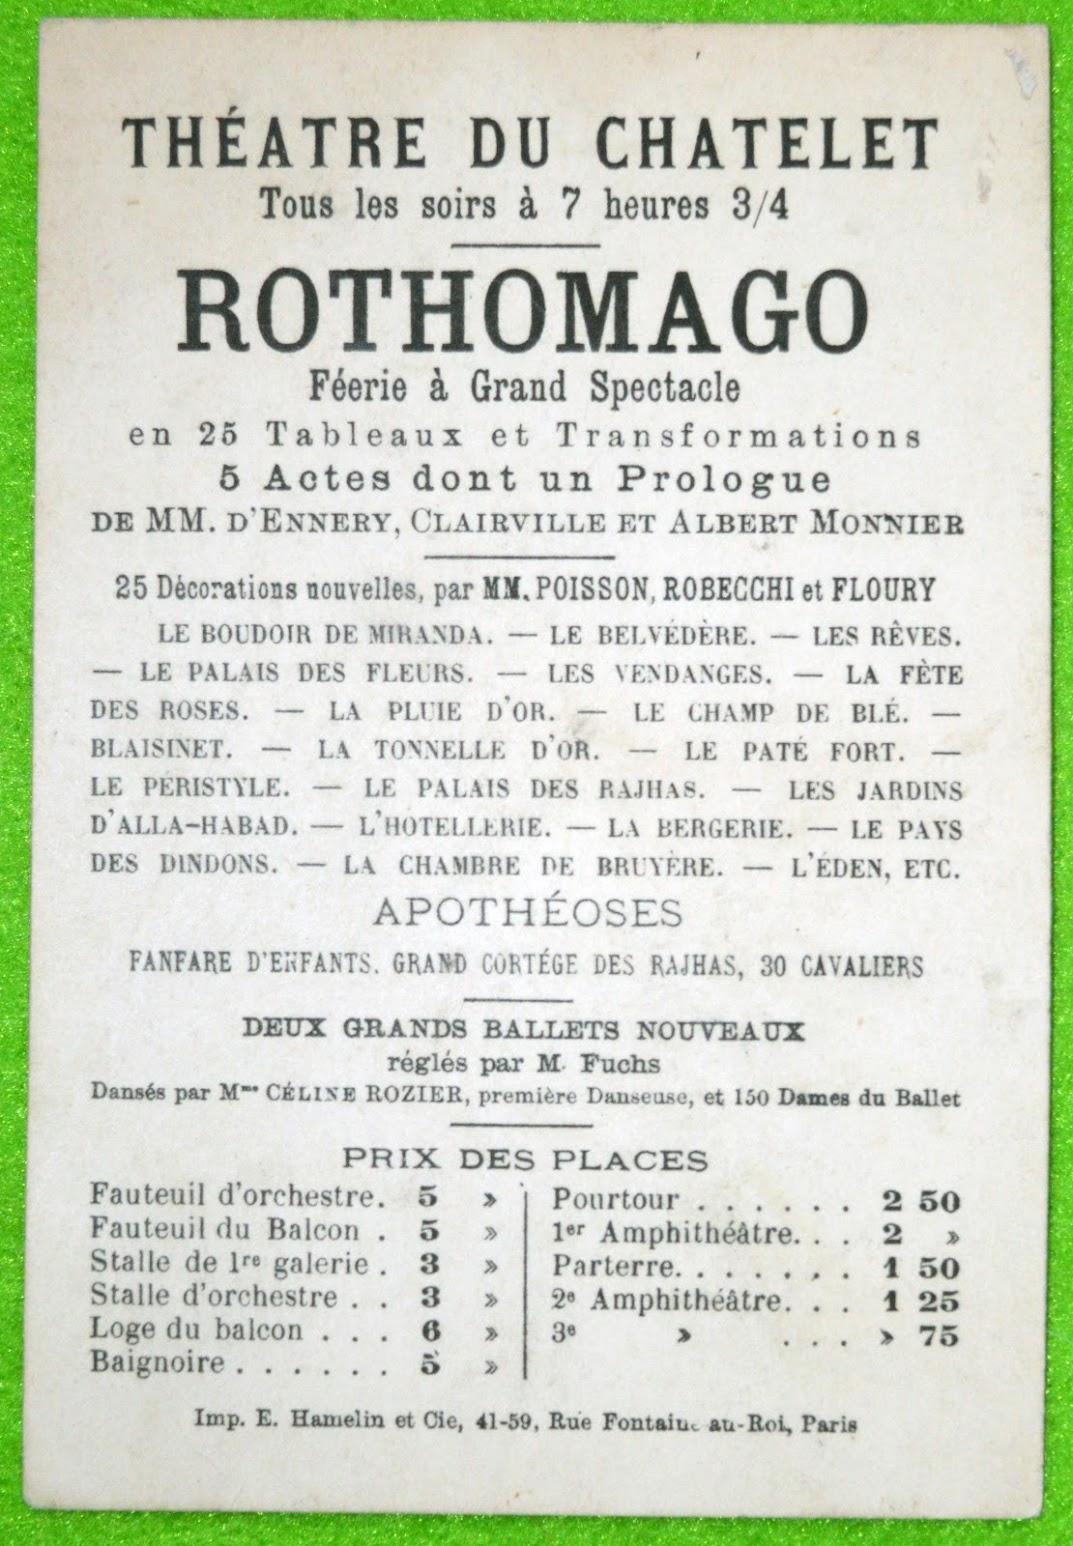 "Rothomago ""Feerie & Grand Spectacle"" - Johannes Rothomago 1880 / 1890"